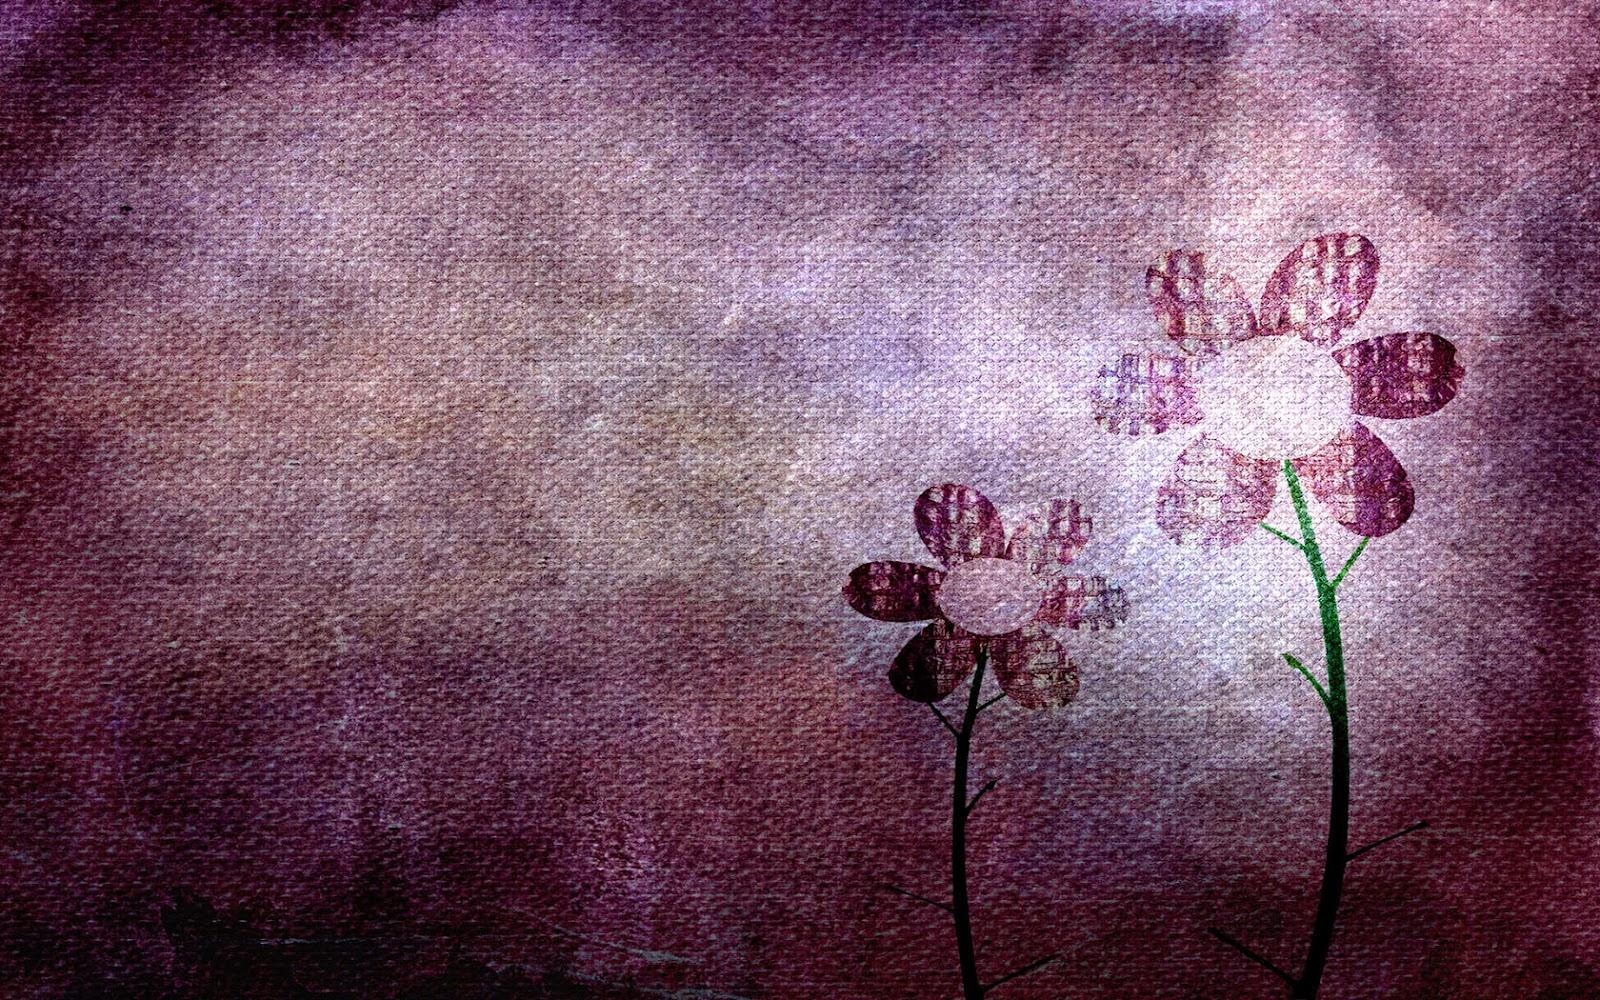 tumblr wallpaper photography - photo #9